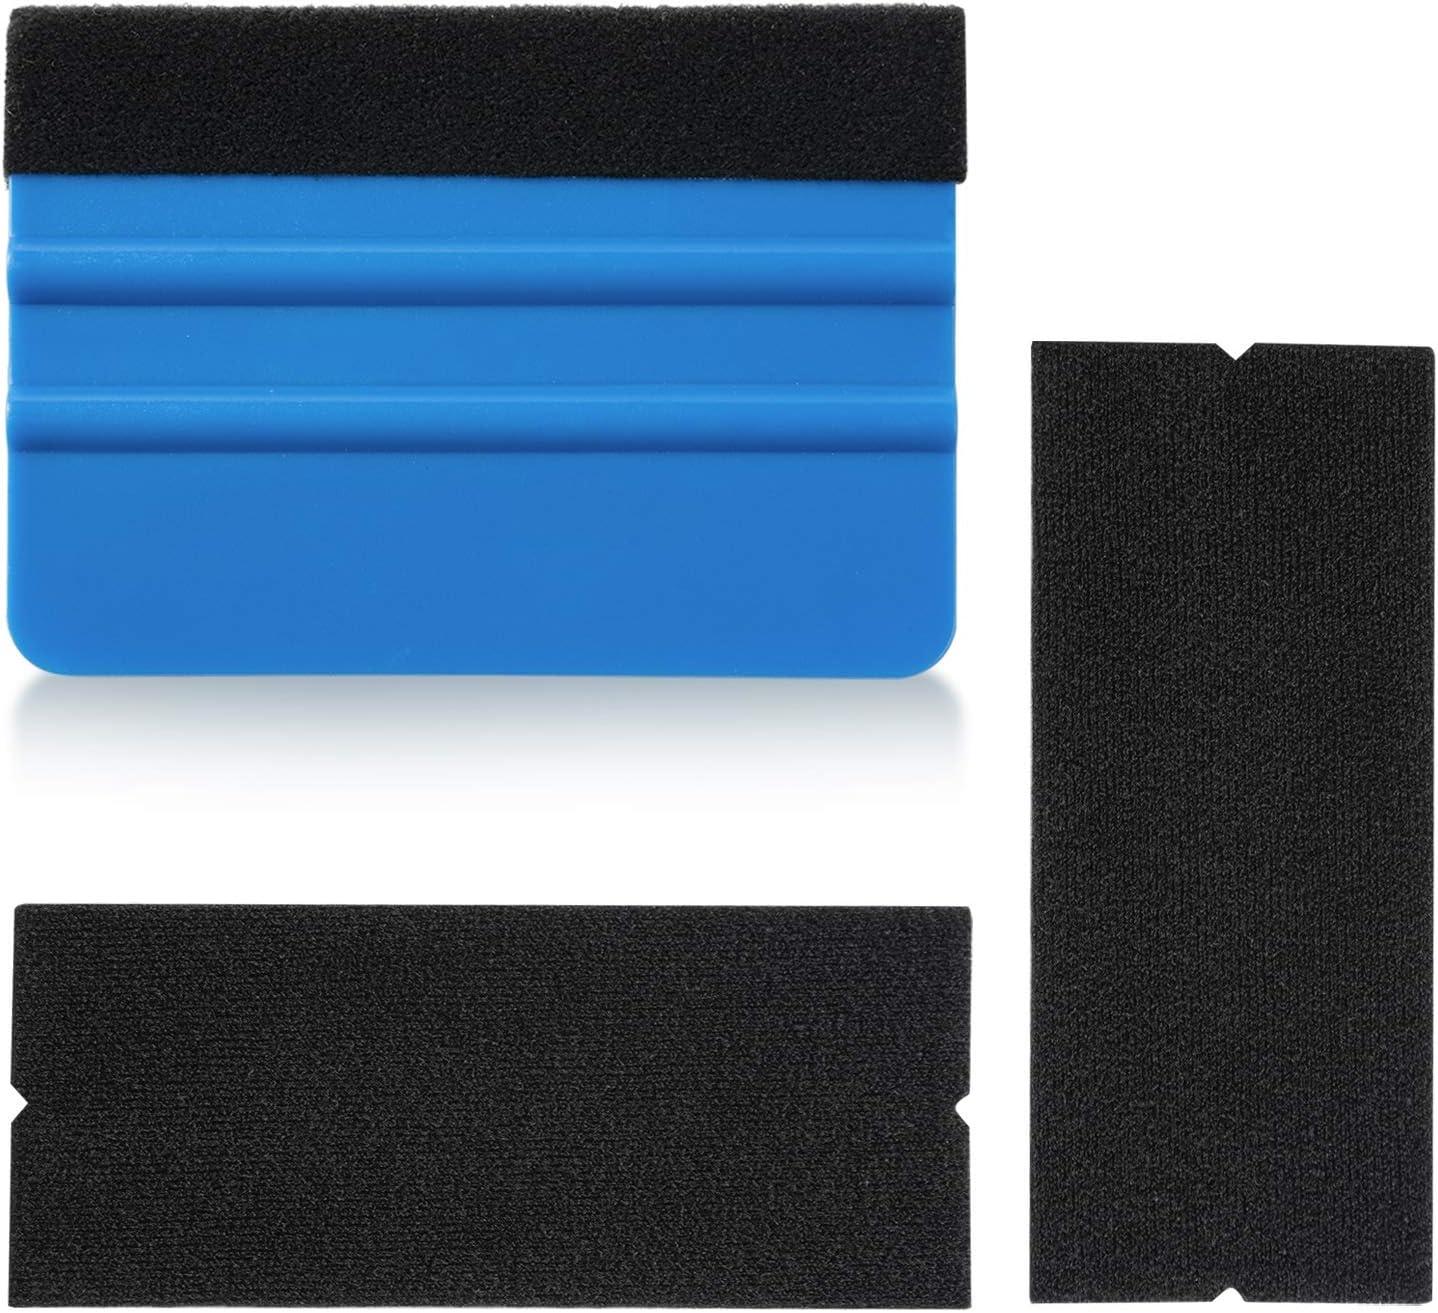 Tapete Craft Adhesive Vinyl Fenstert/önung Scrapbooking Vinylschaber Wrap Rakel Applikator Tool mit 2er Pack schwarzer Filzkante f/ür Auto Vinyl Wrap Peirich DIY Bastelwerkzeug Set Schriftzug